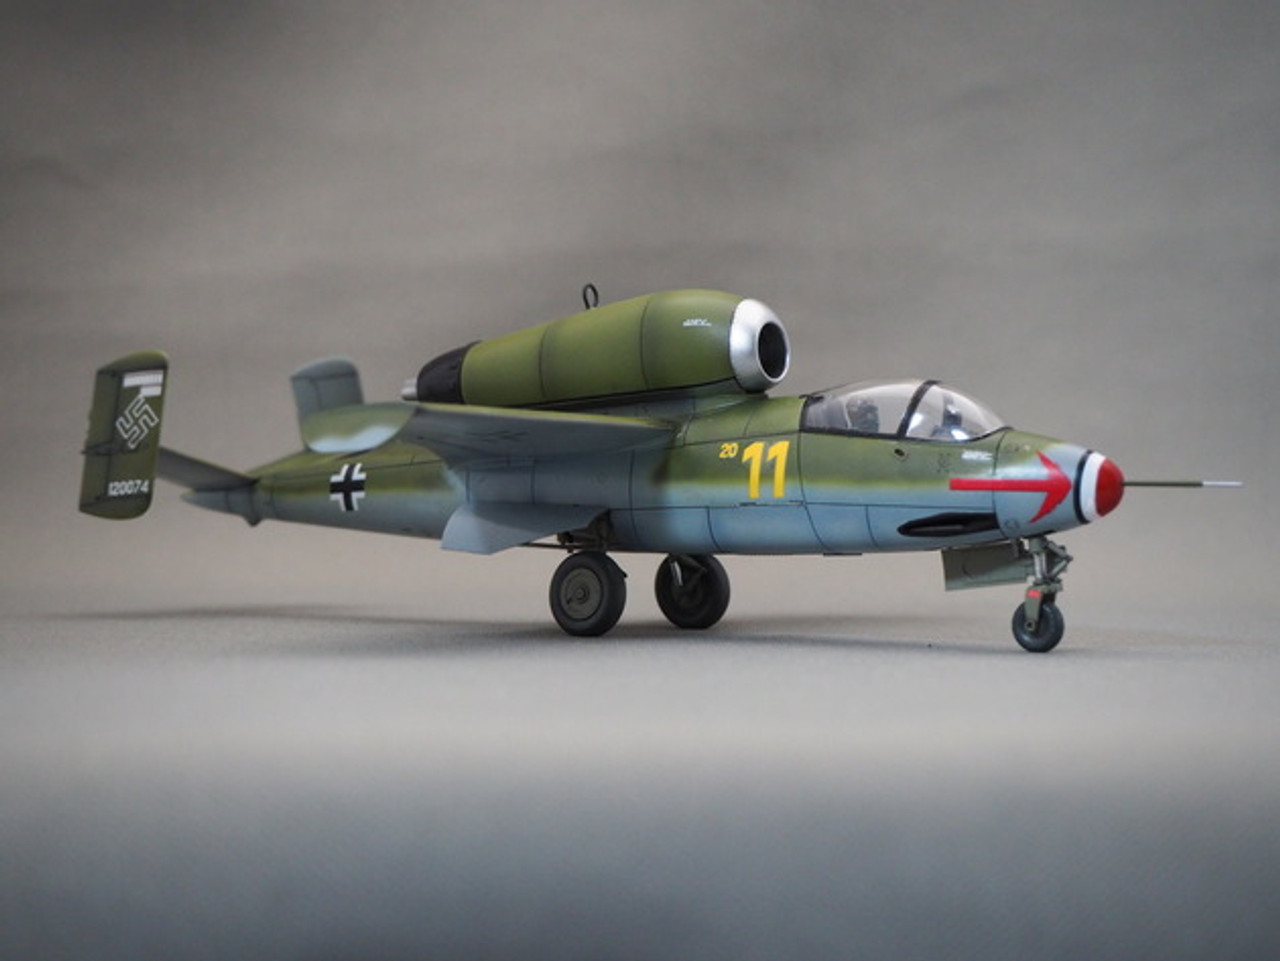 1//48 AIRCRAFT Model Kit-TAMIYA 61097 Heinkel He 162 A2 SALAMANDRE